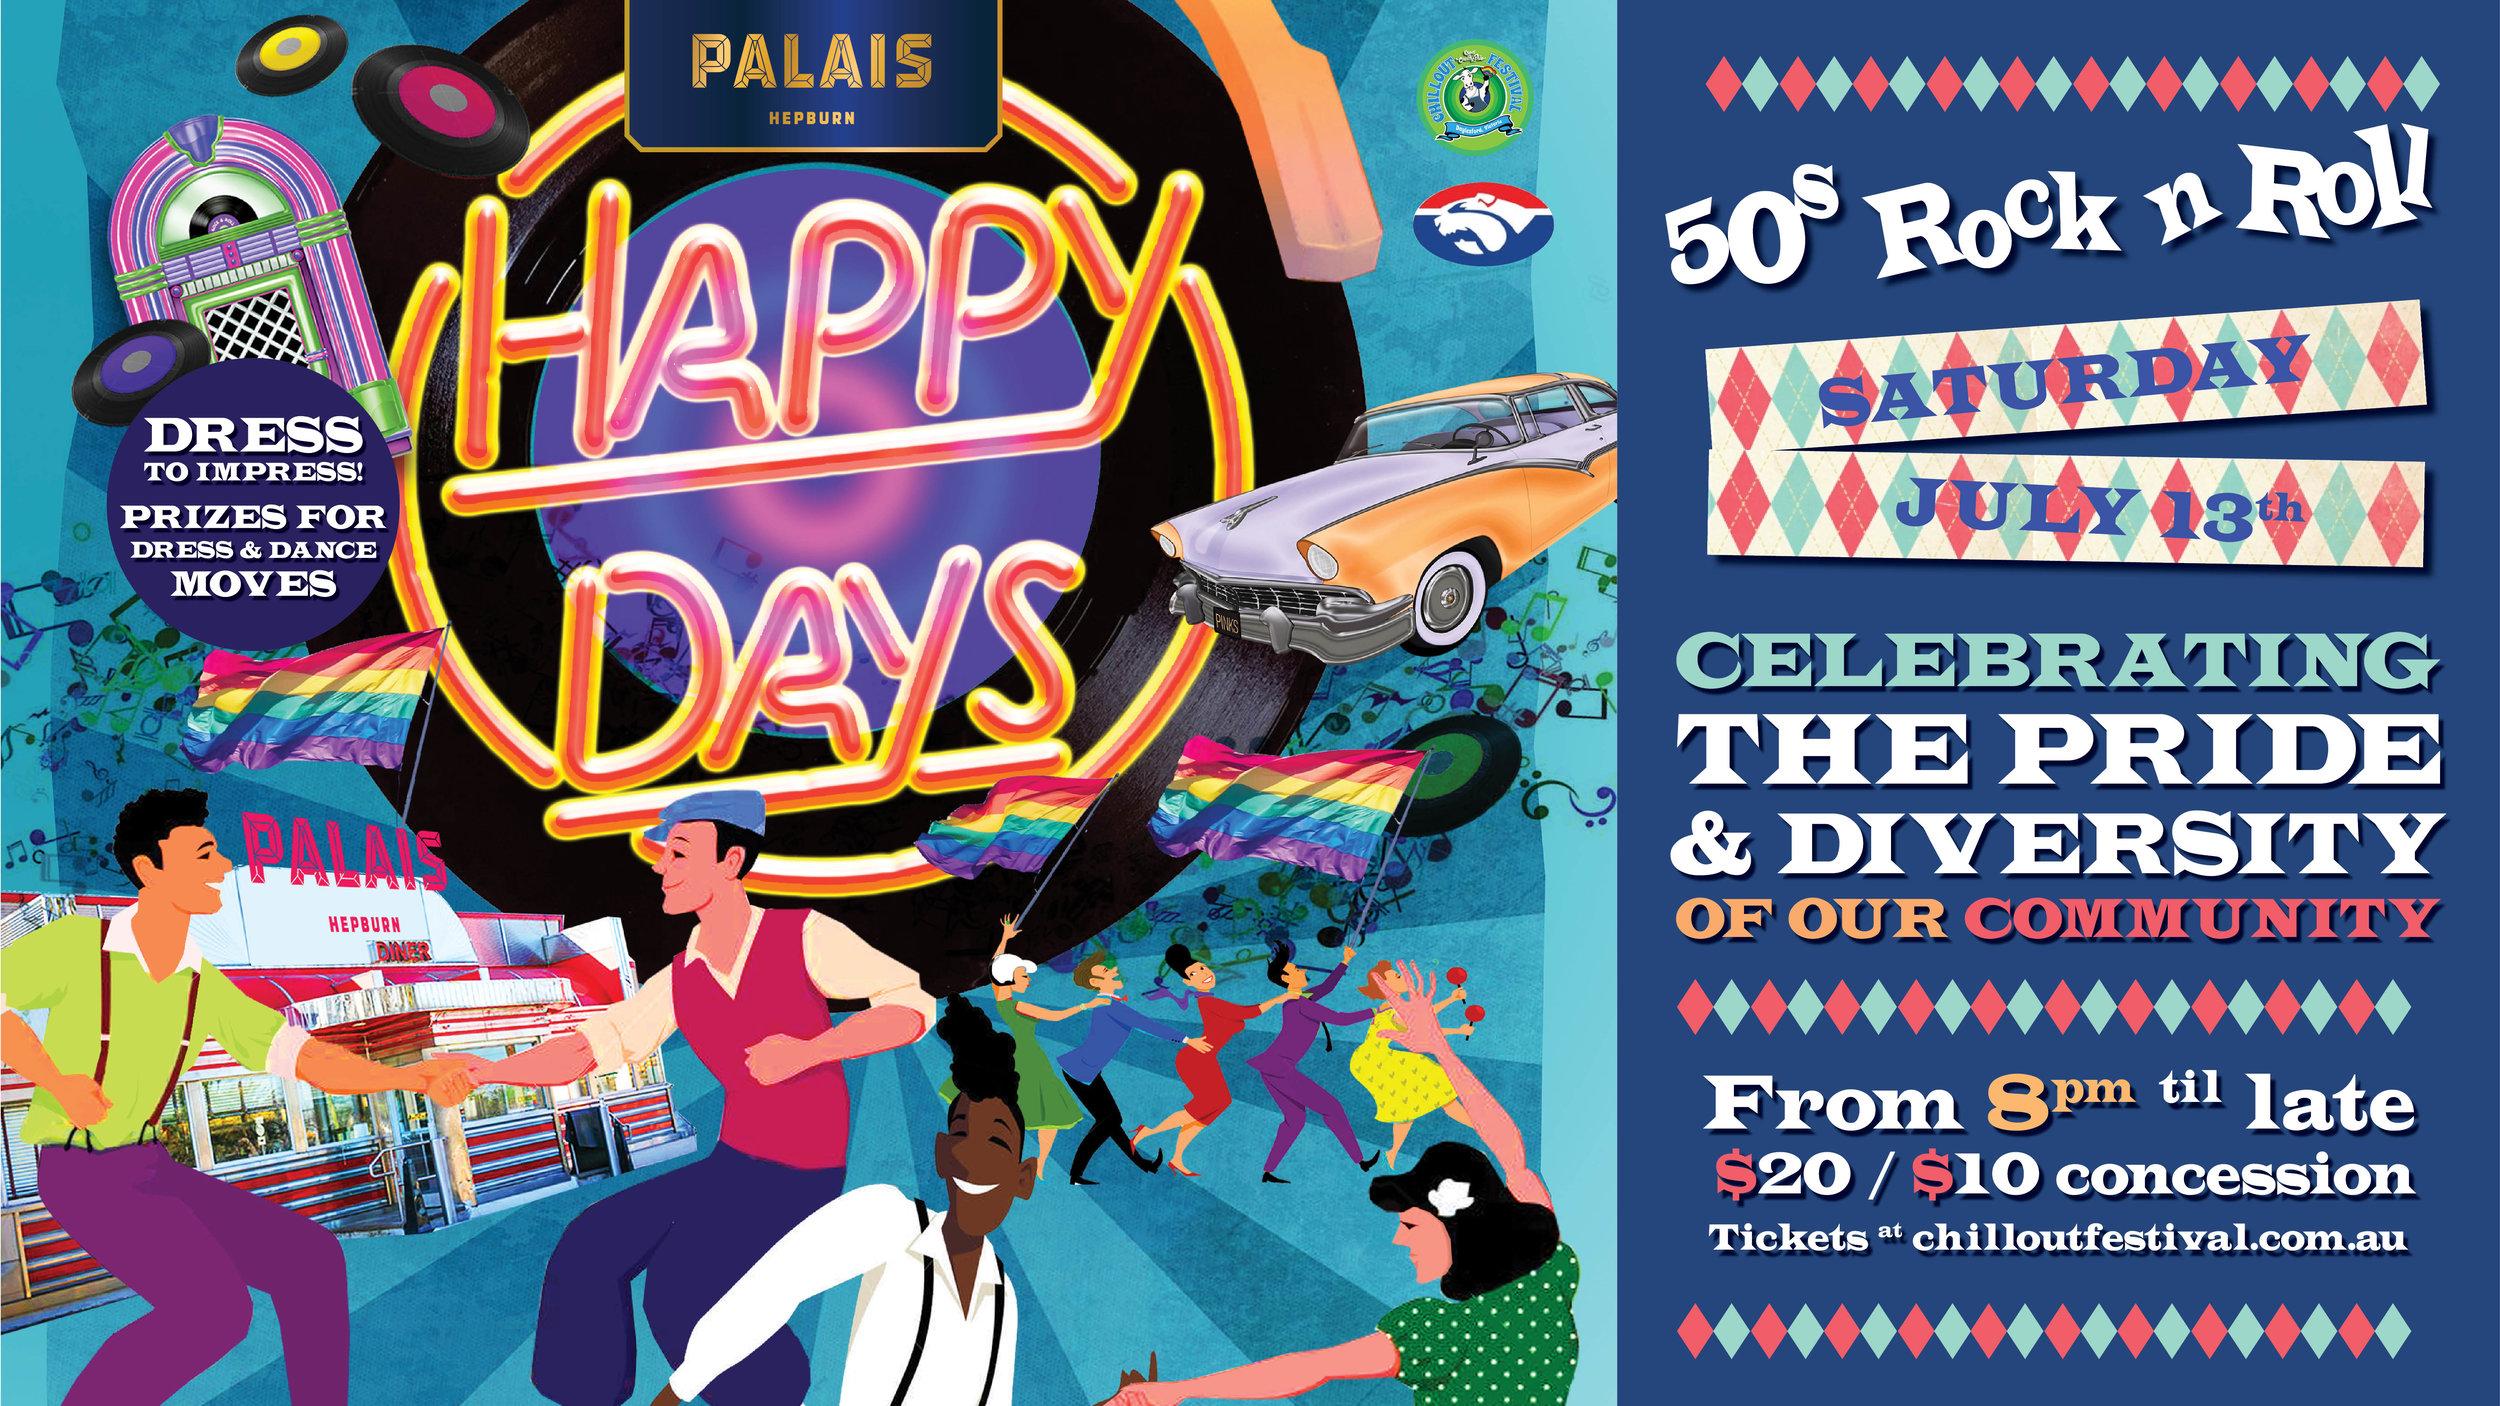 PALAIS_HAPPY_DAYS_FACEBOOK.jpg